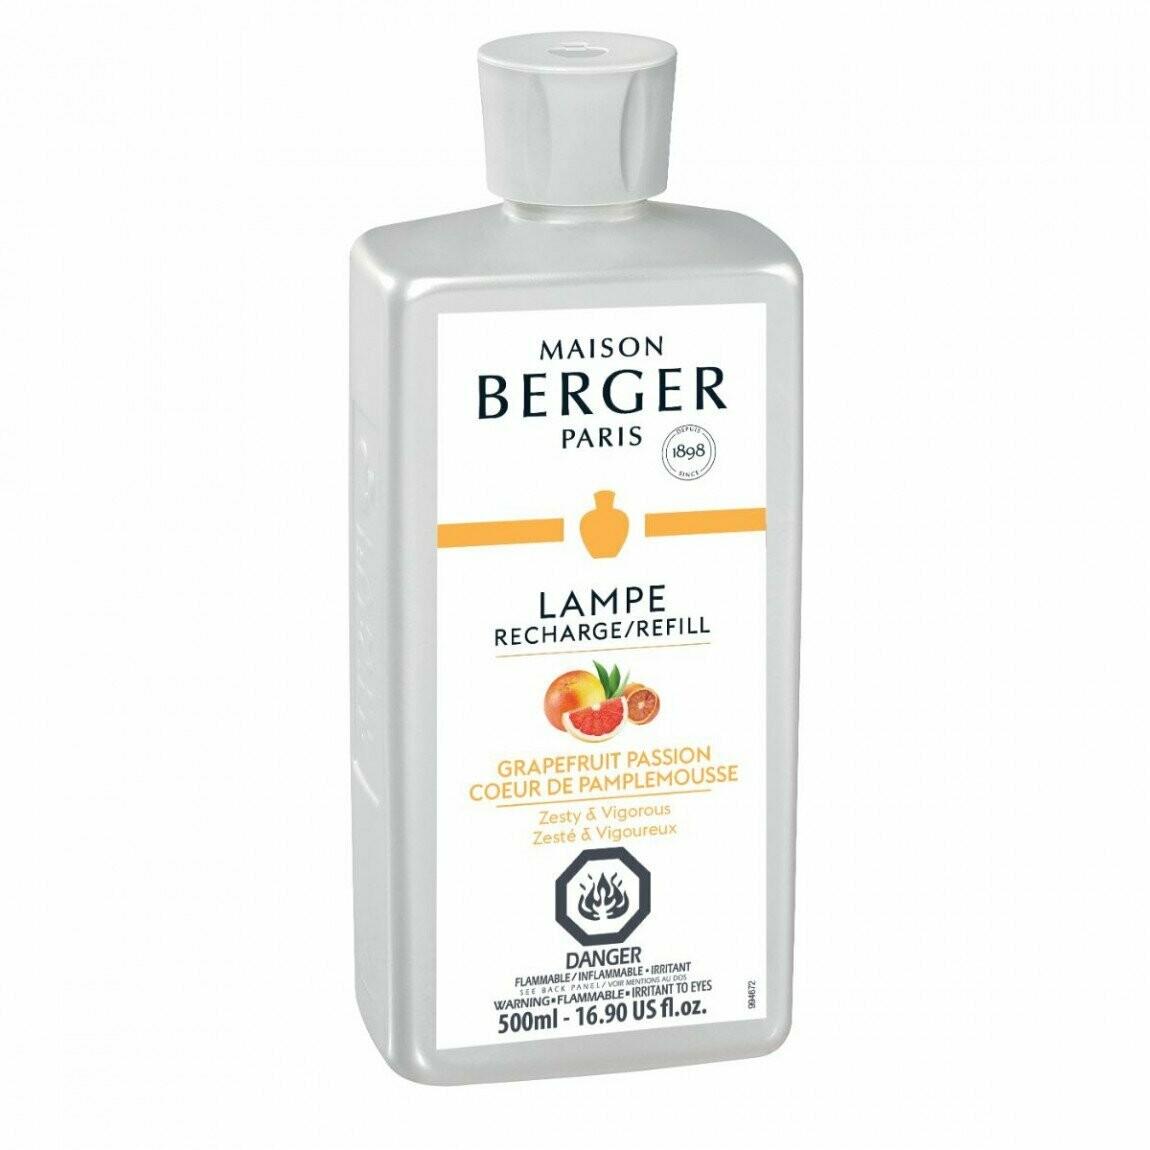 Grapefruit Passion 500 ml Fragrance